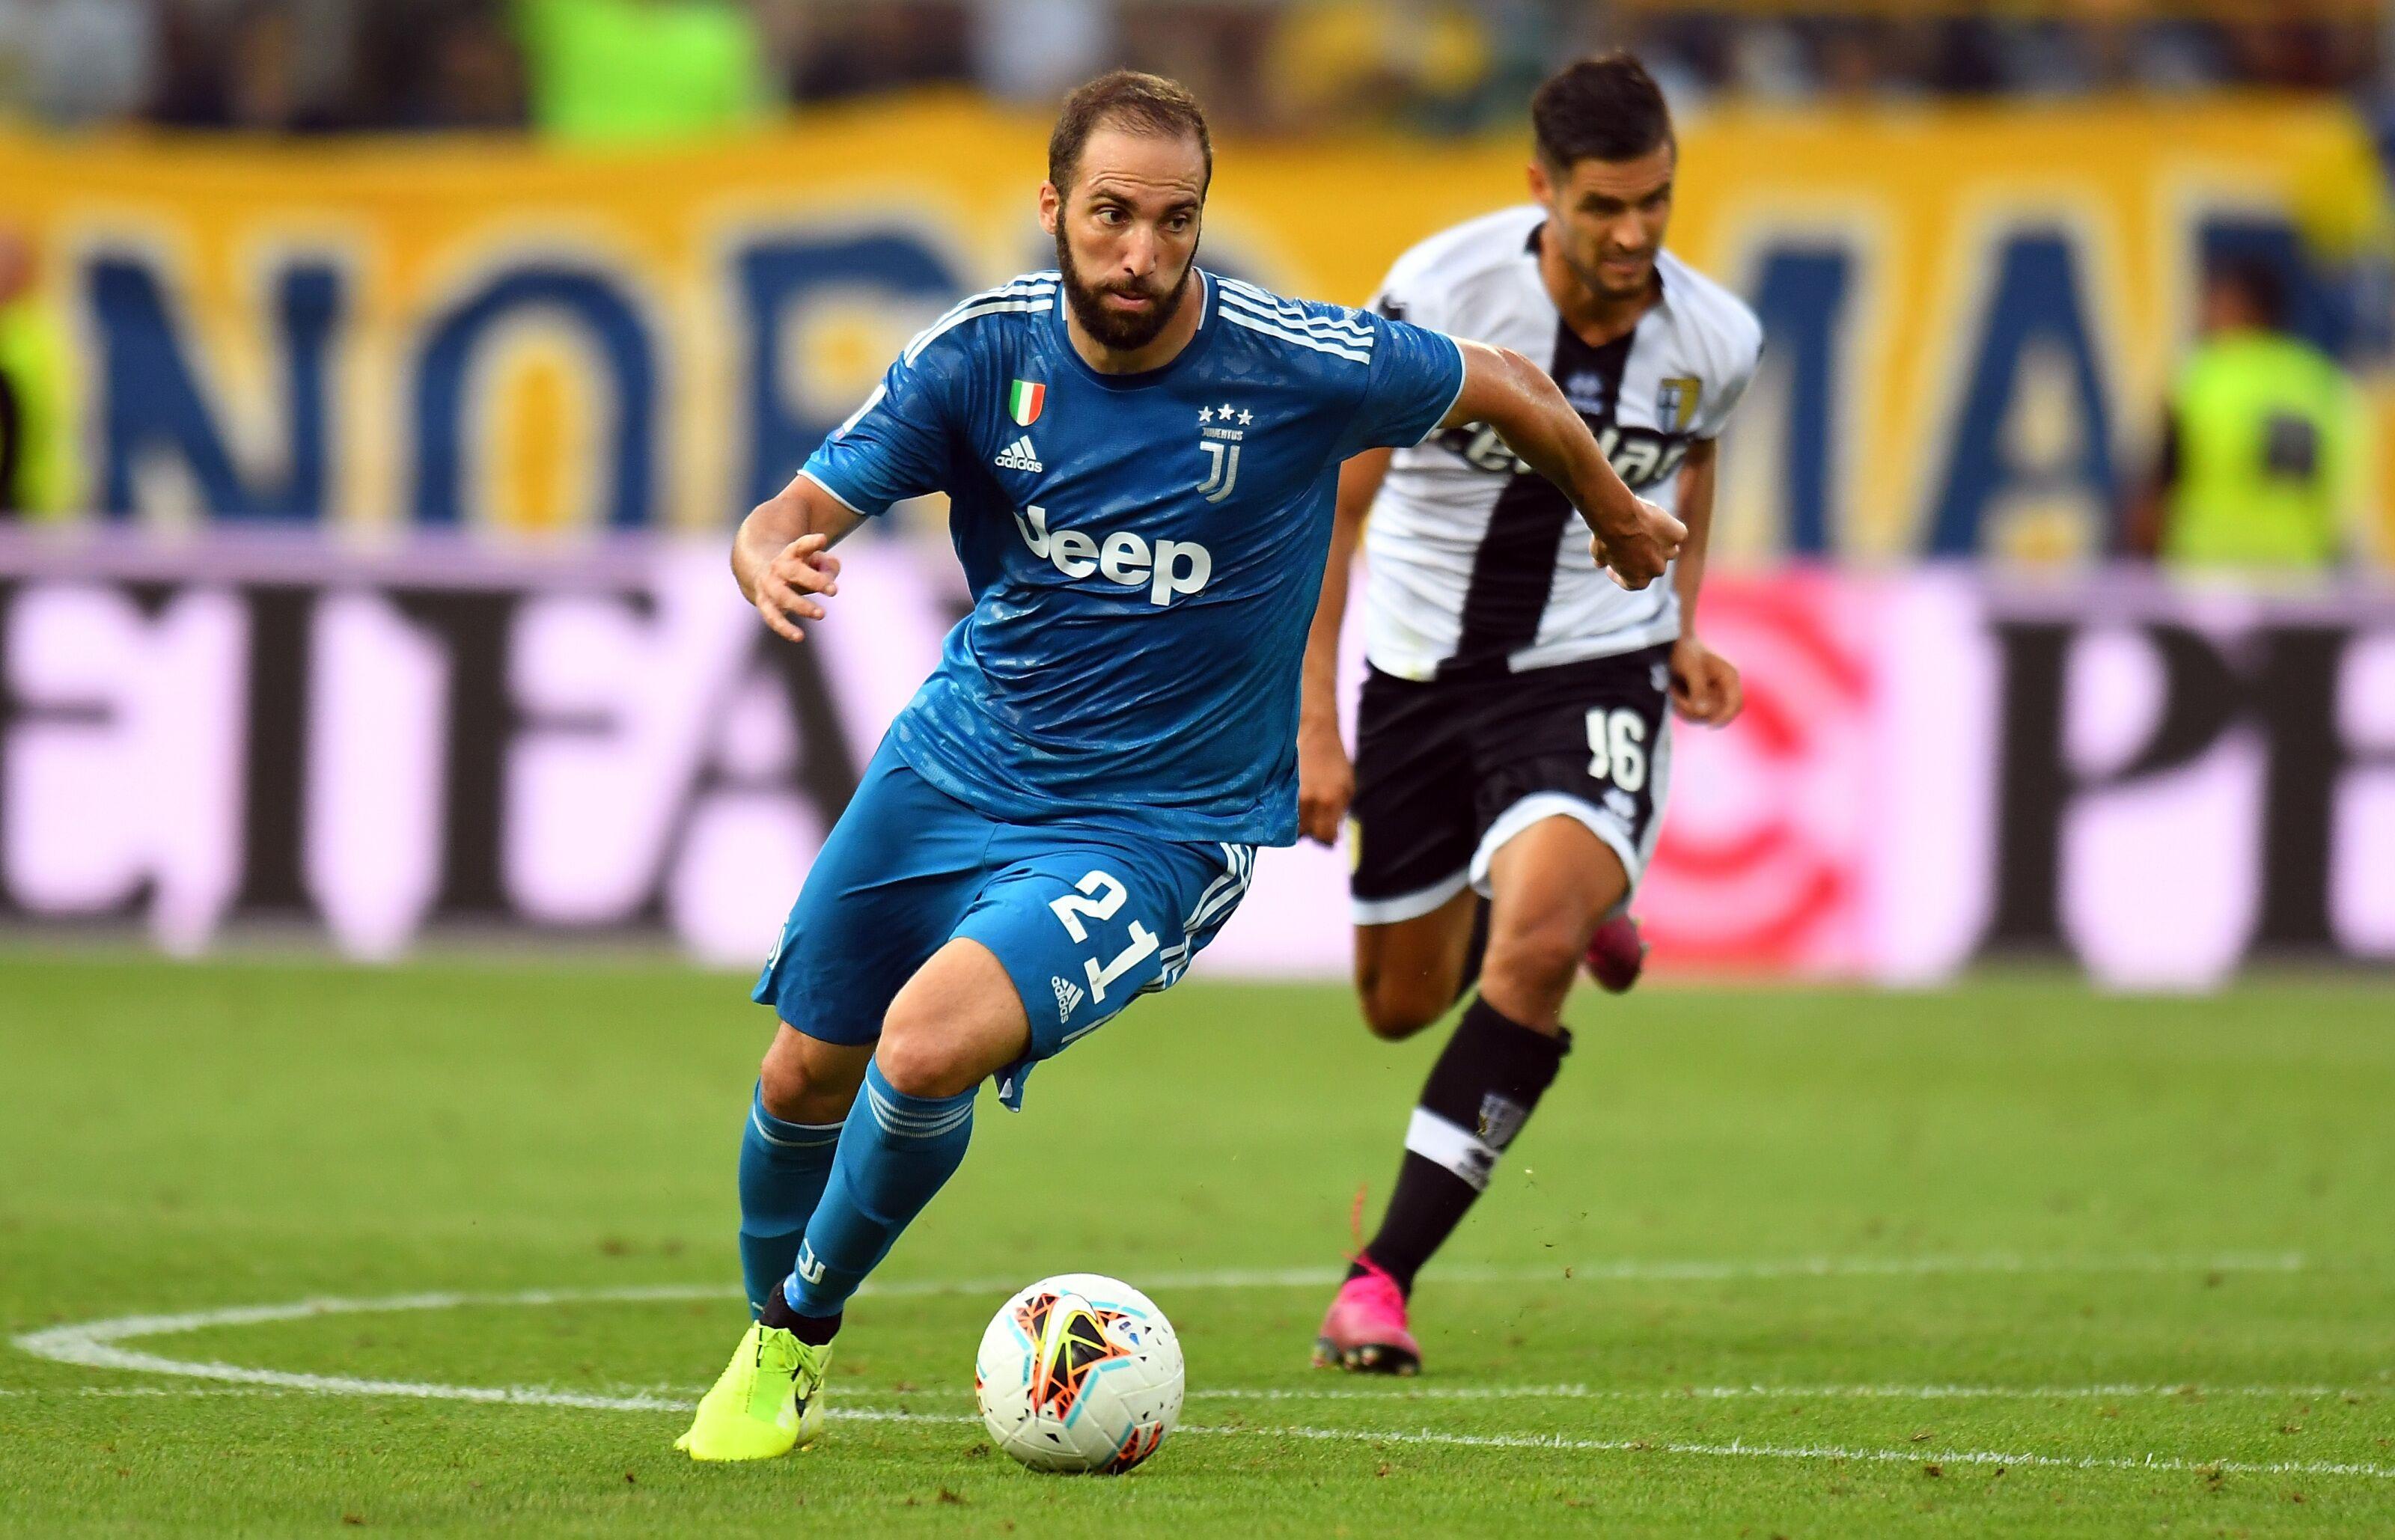 Maurizio Sarri won't find it easy to make Juventus likable